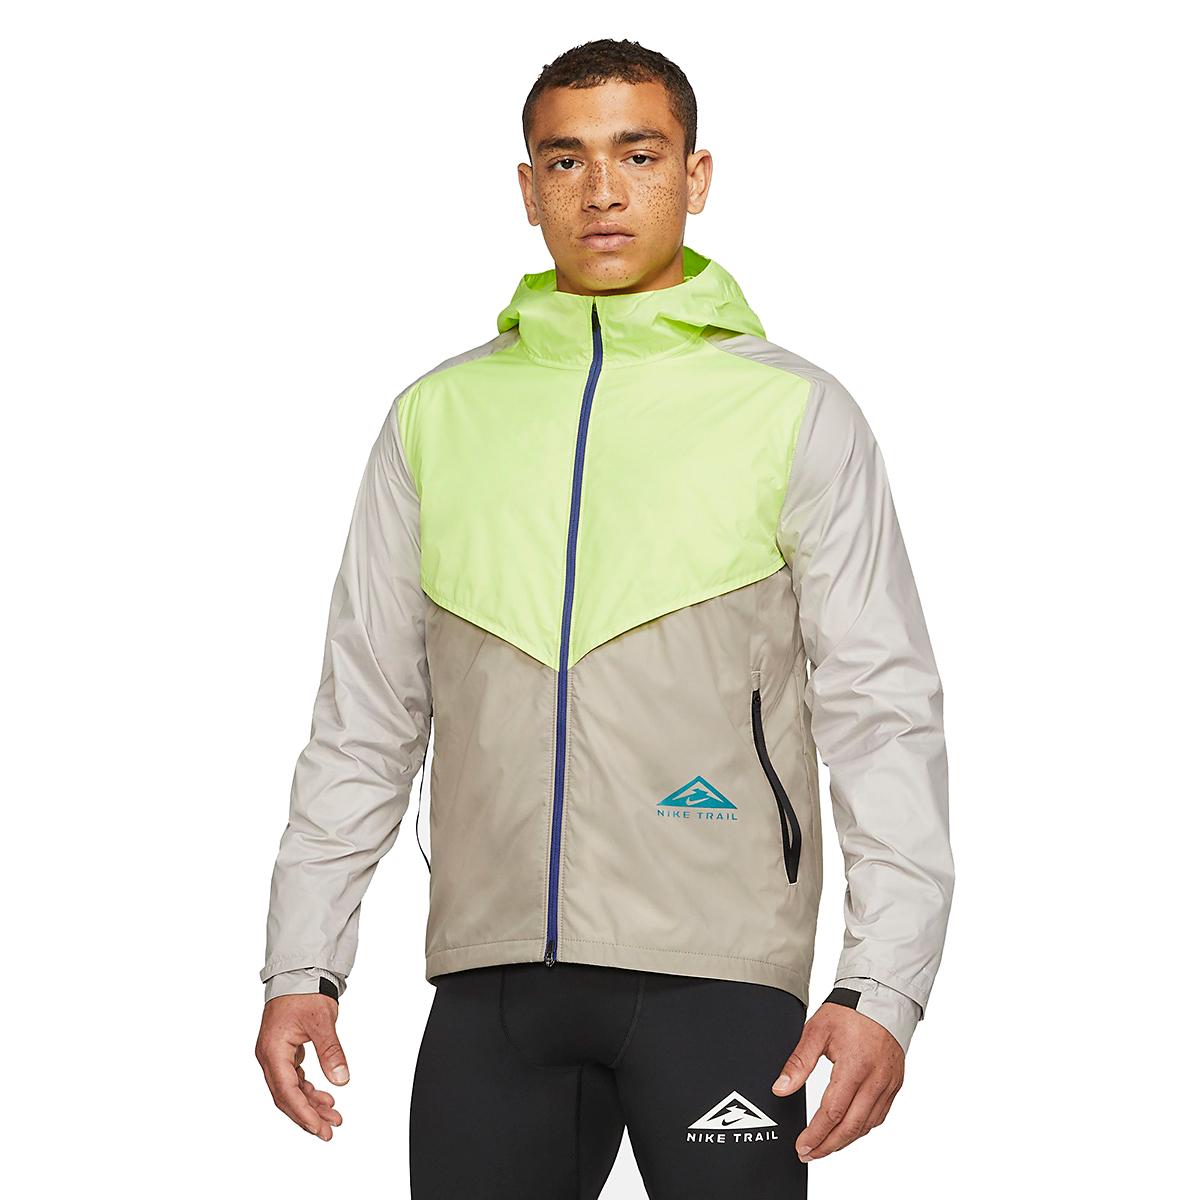 Men's Nike Windrunner Trail Running Jacket - Color: Light Lemon Twist/Moon Fossil/Bright Spruce - Size: S, Light Lemon Twist/Moon Fossil/Bright Spruce, large, image 1